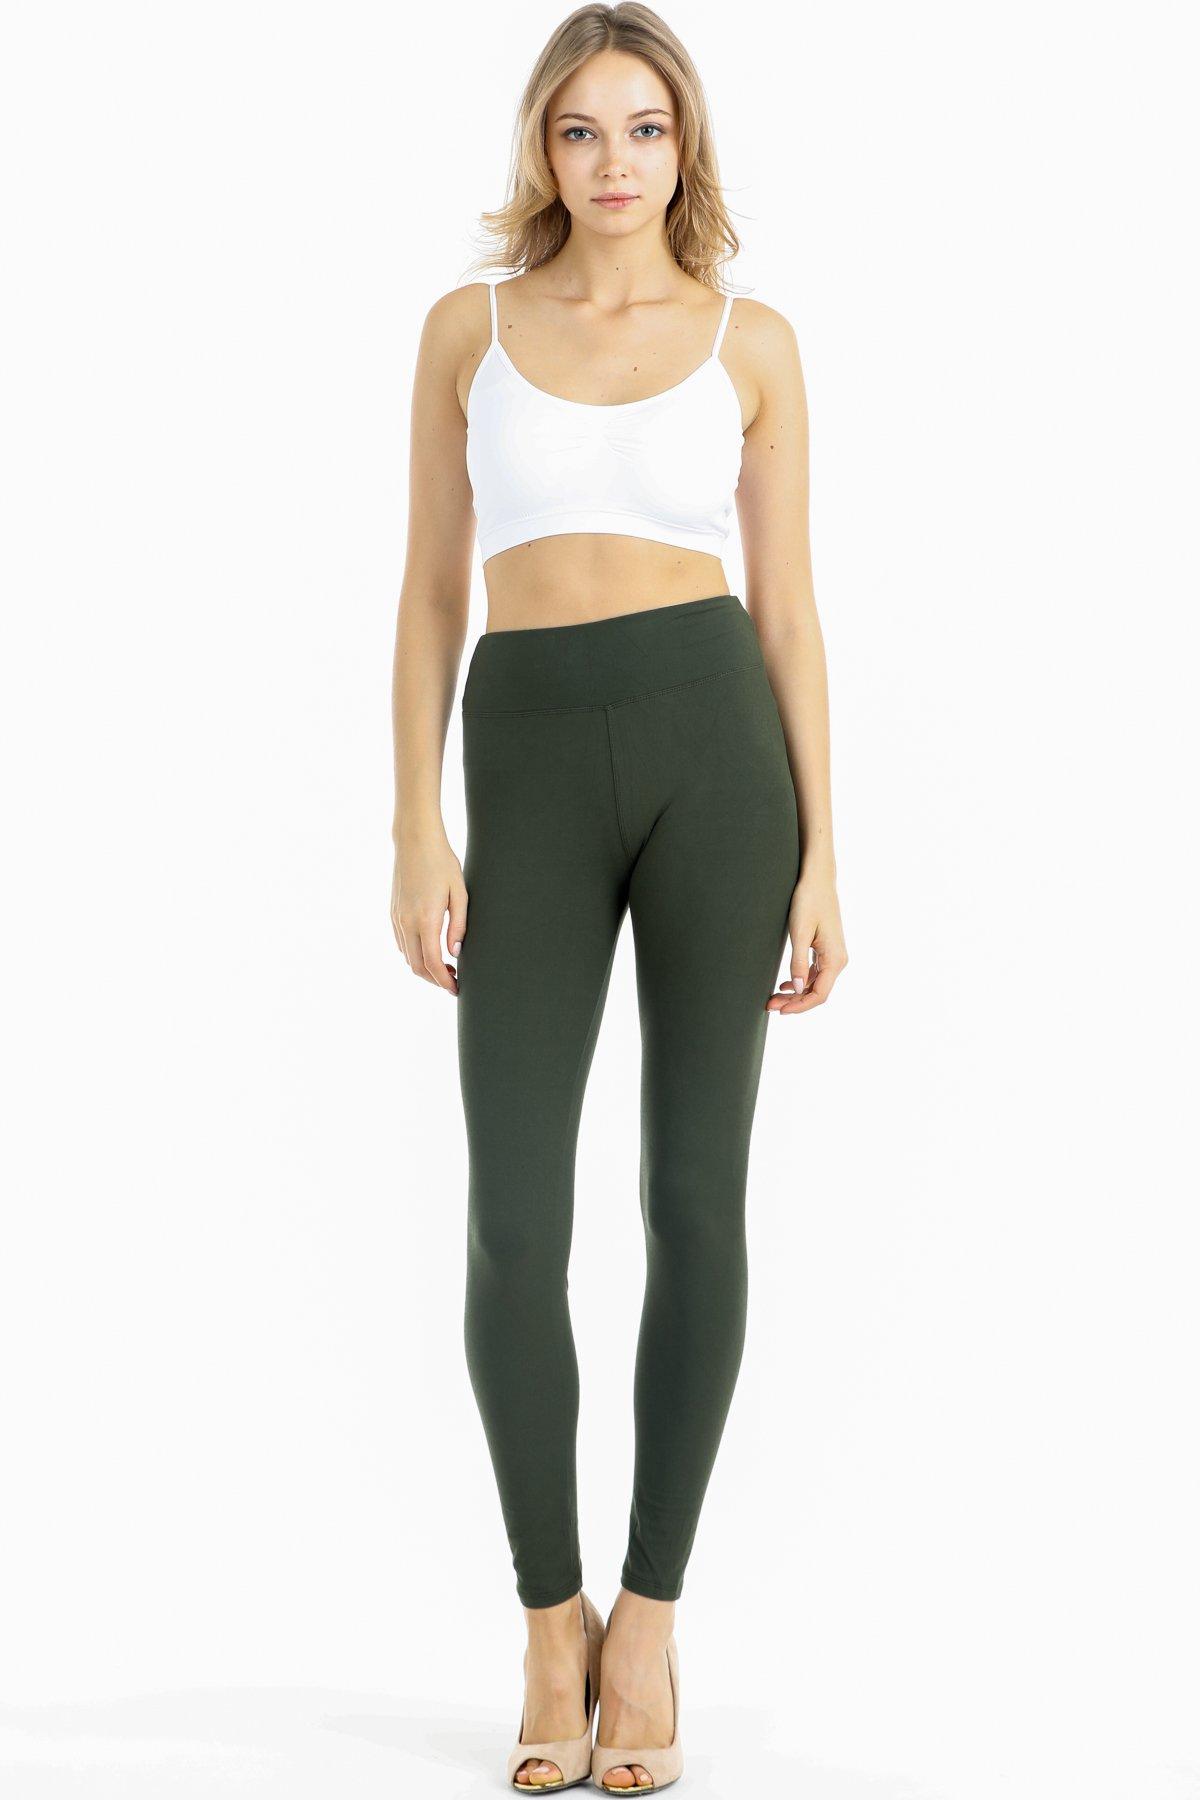 Silky Soft Non See Thru High Waist Premium Yoga Leggings (Plus Size(12-22), Olive)